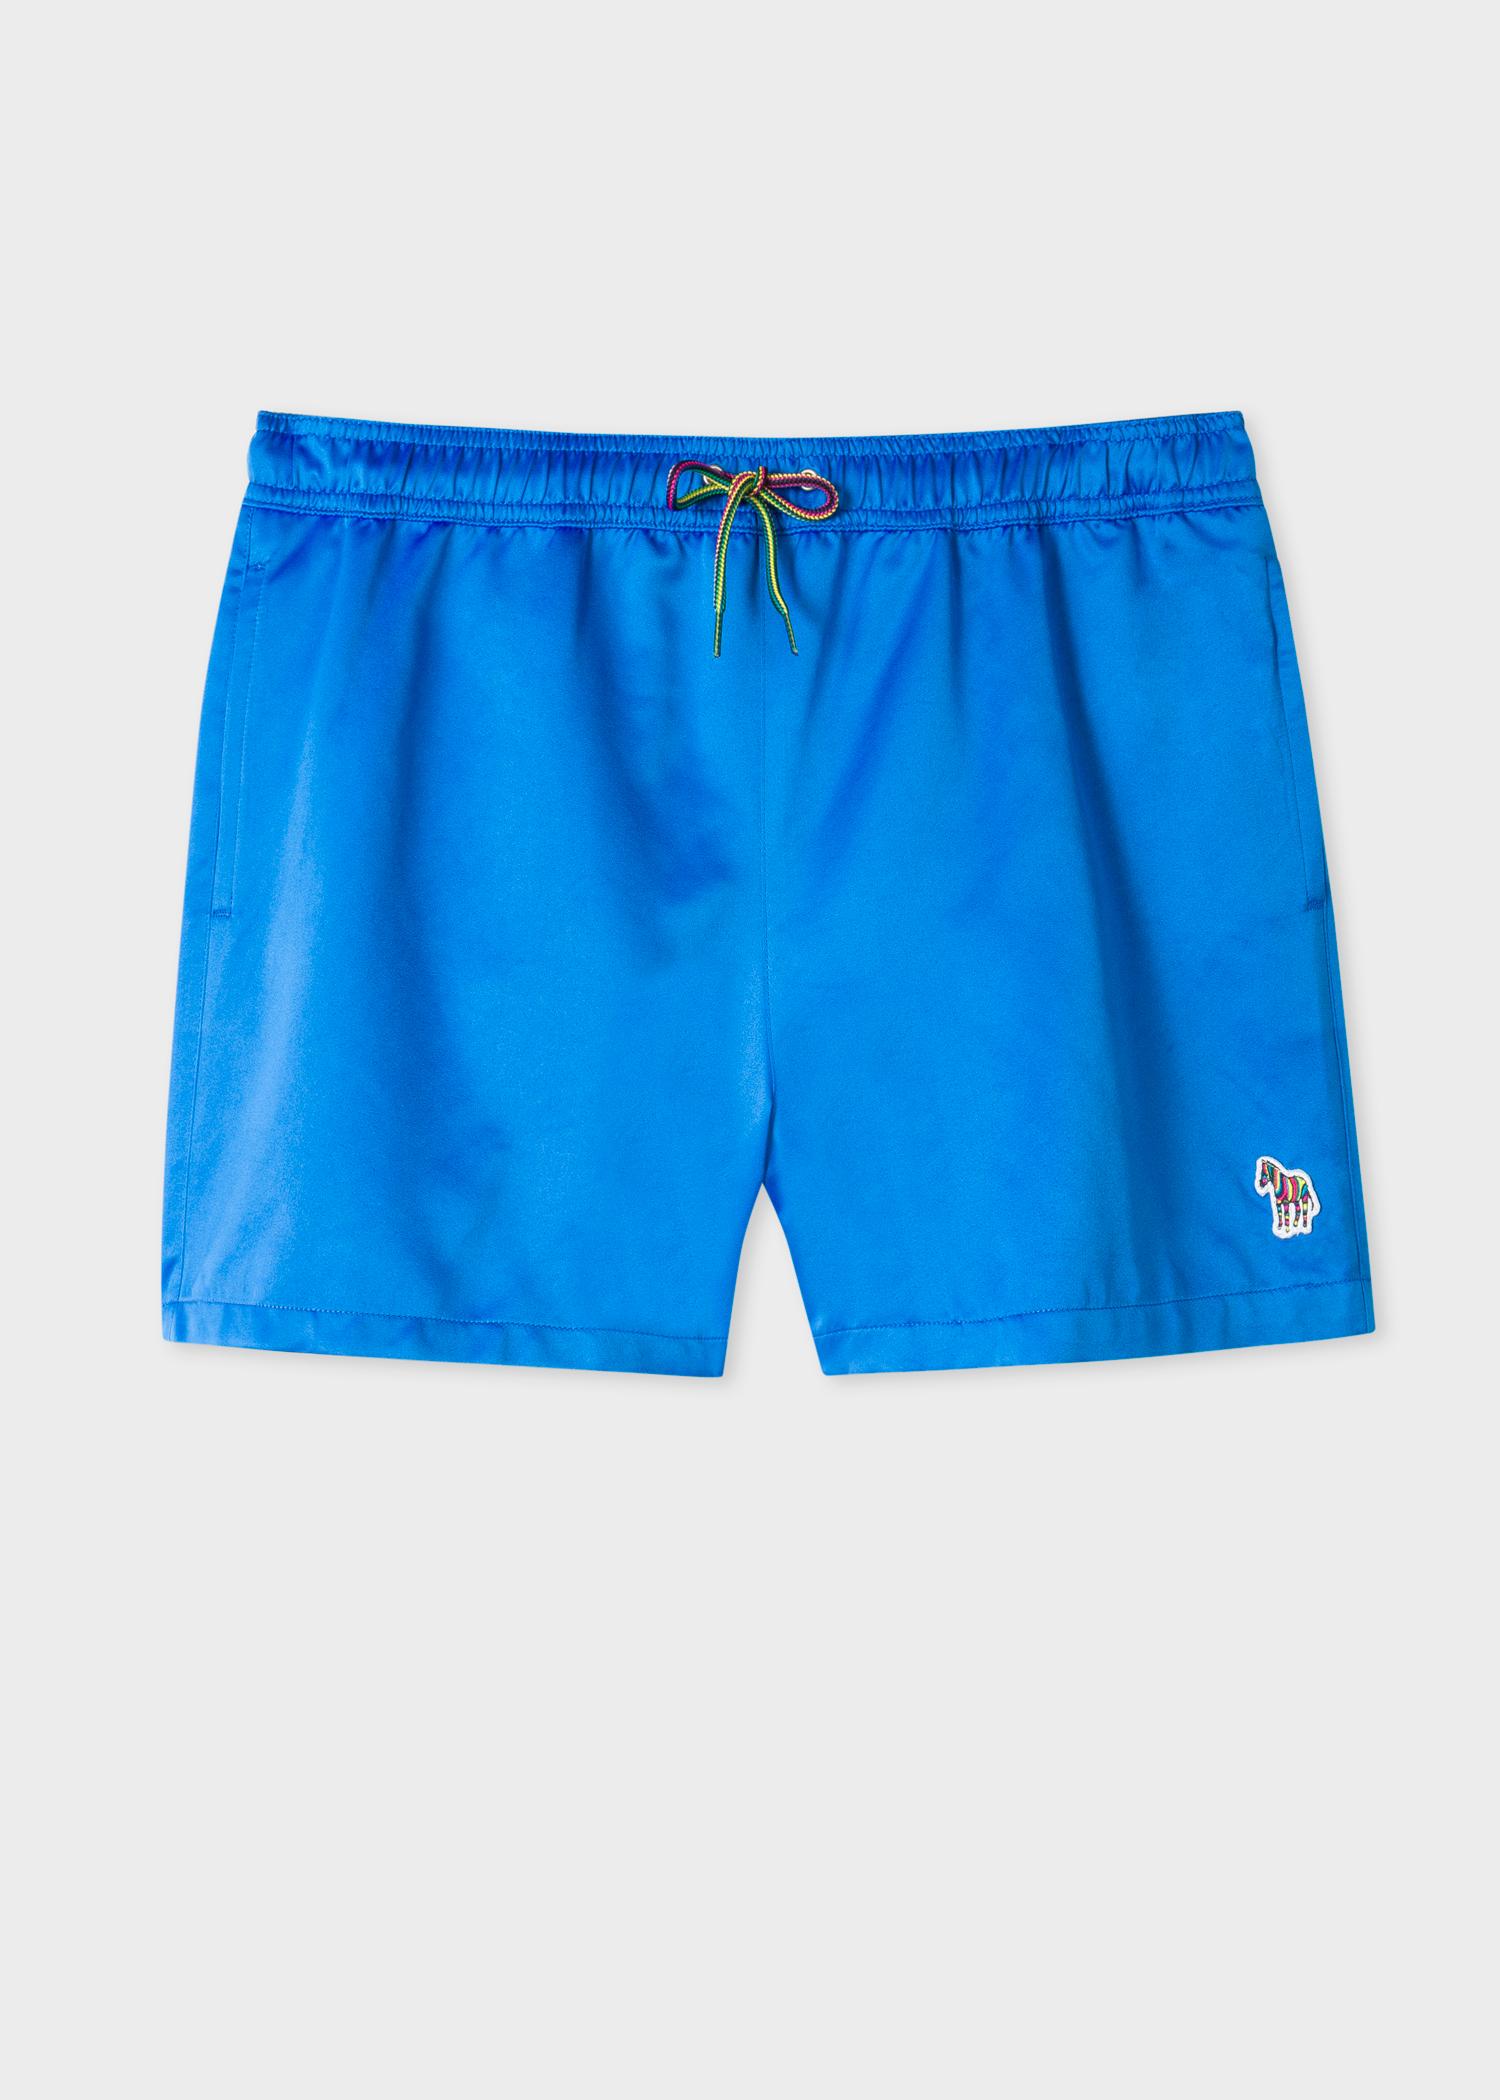 48dddfde79 Front view- Men's Blue Zebra Logo Swim Shorts by Paul Smith